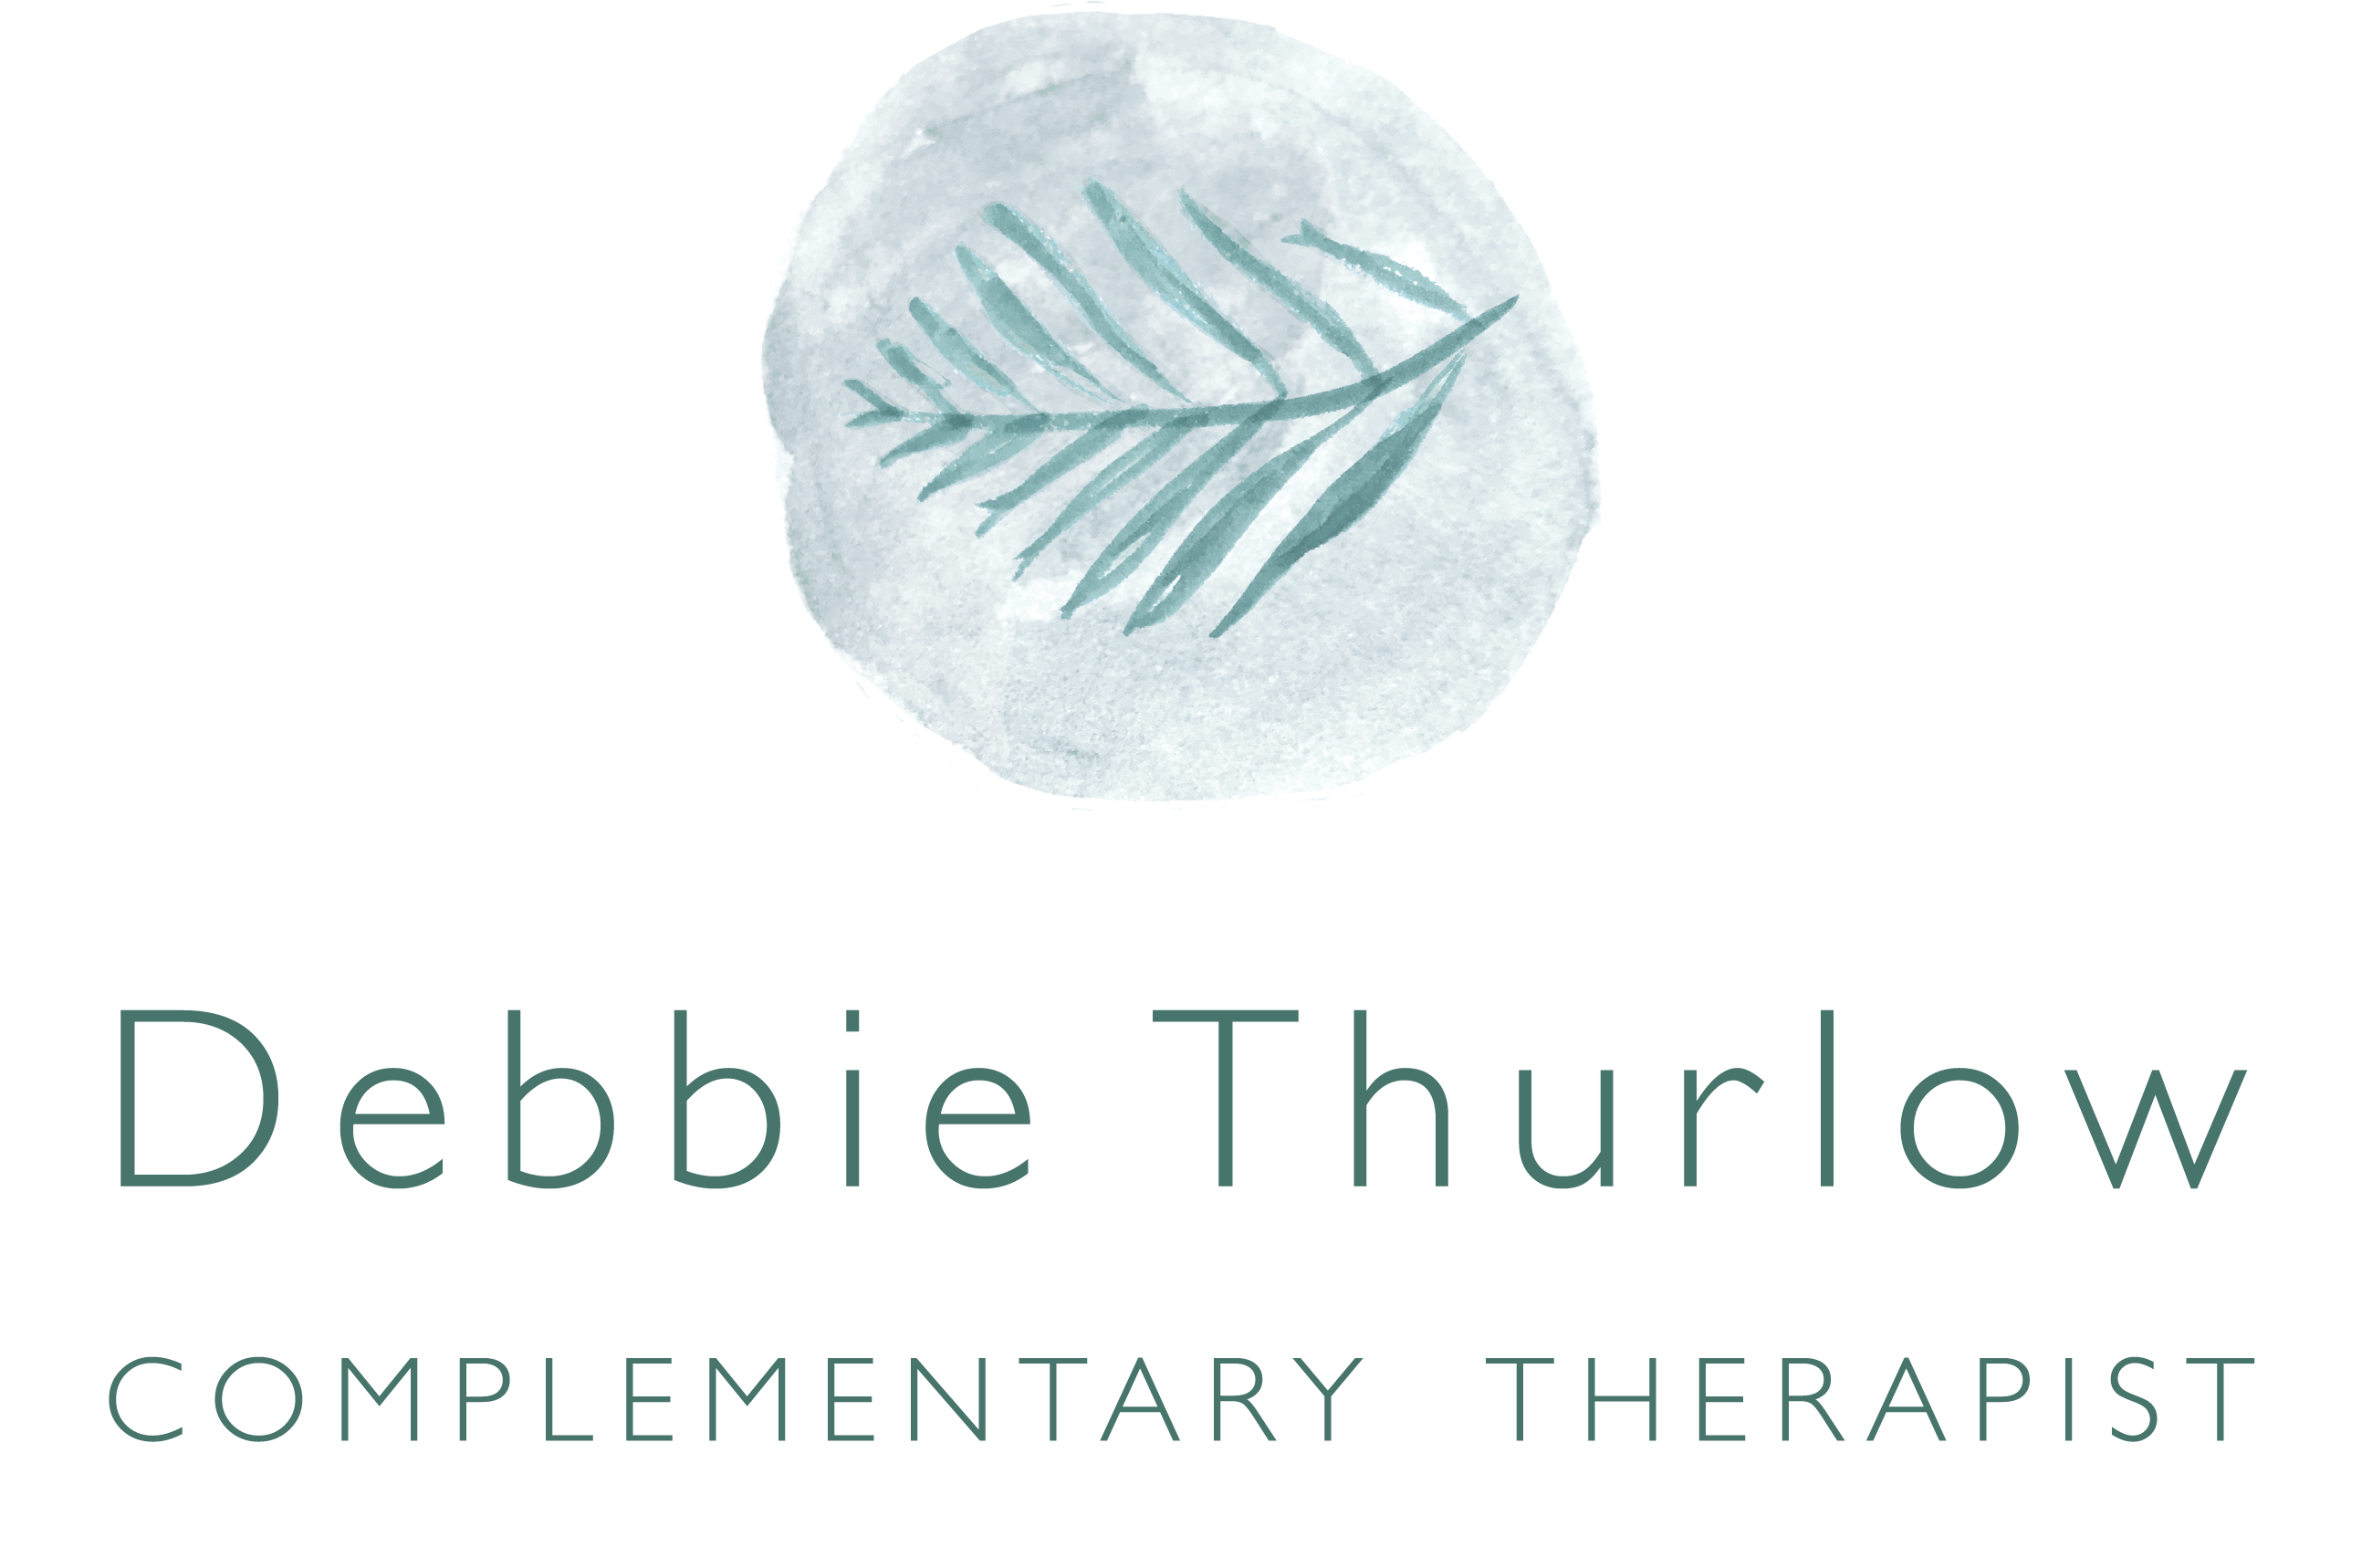 Debbie Thurlow